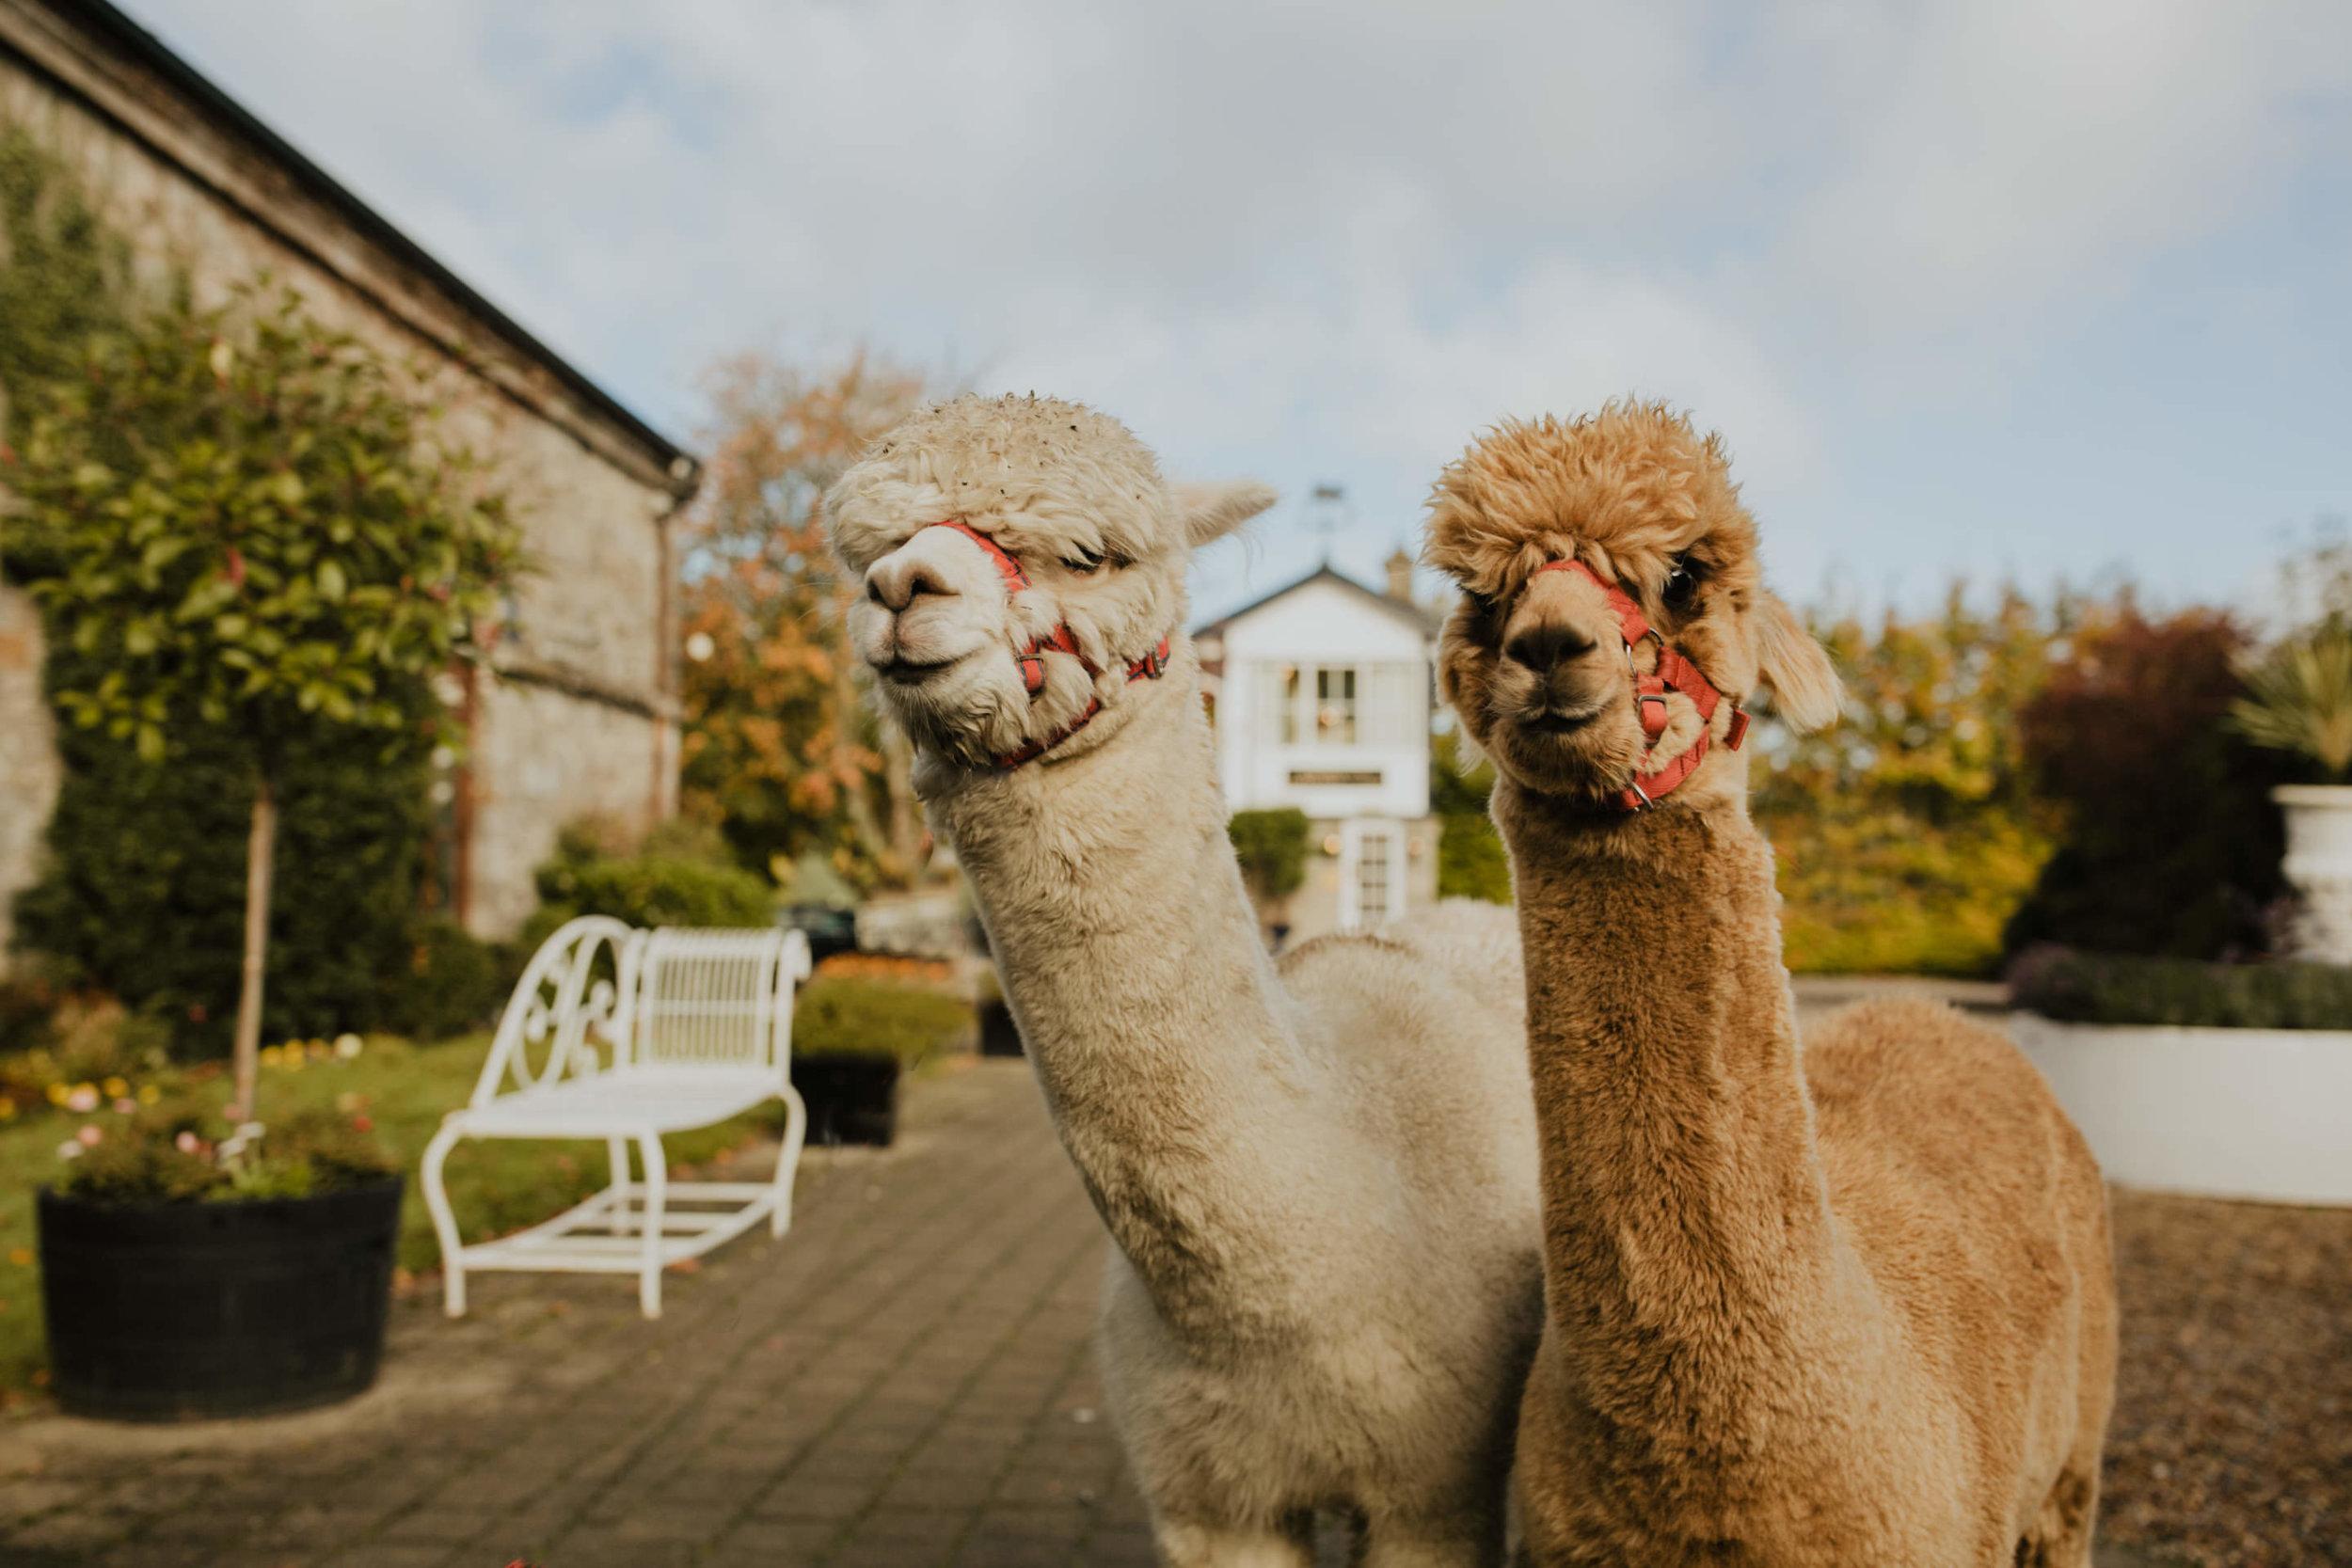 boho_wedding_alpaca_xpose_station_house_livia_figueiredo_photography_01.jpg